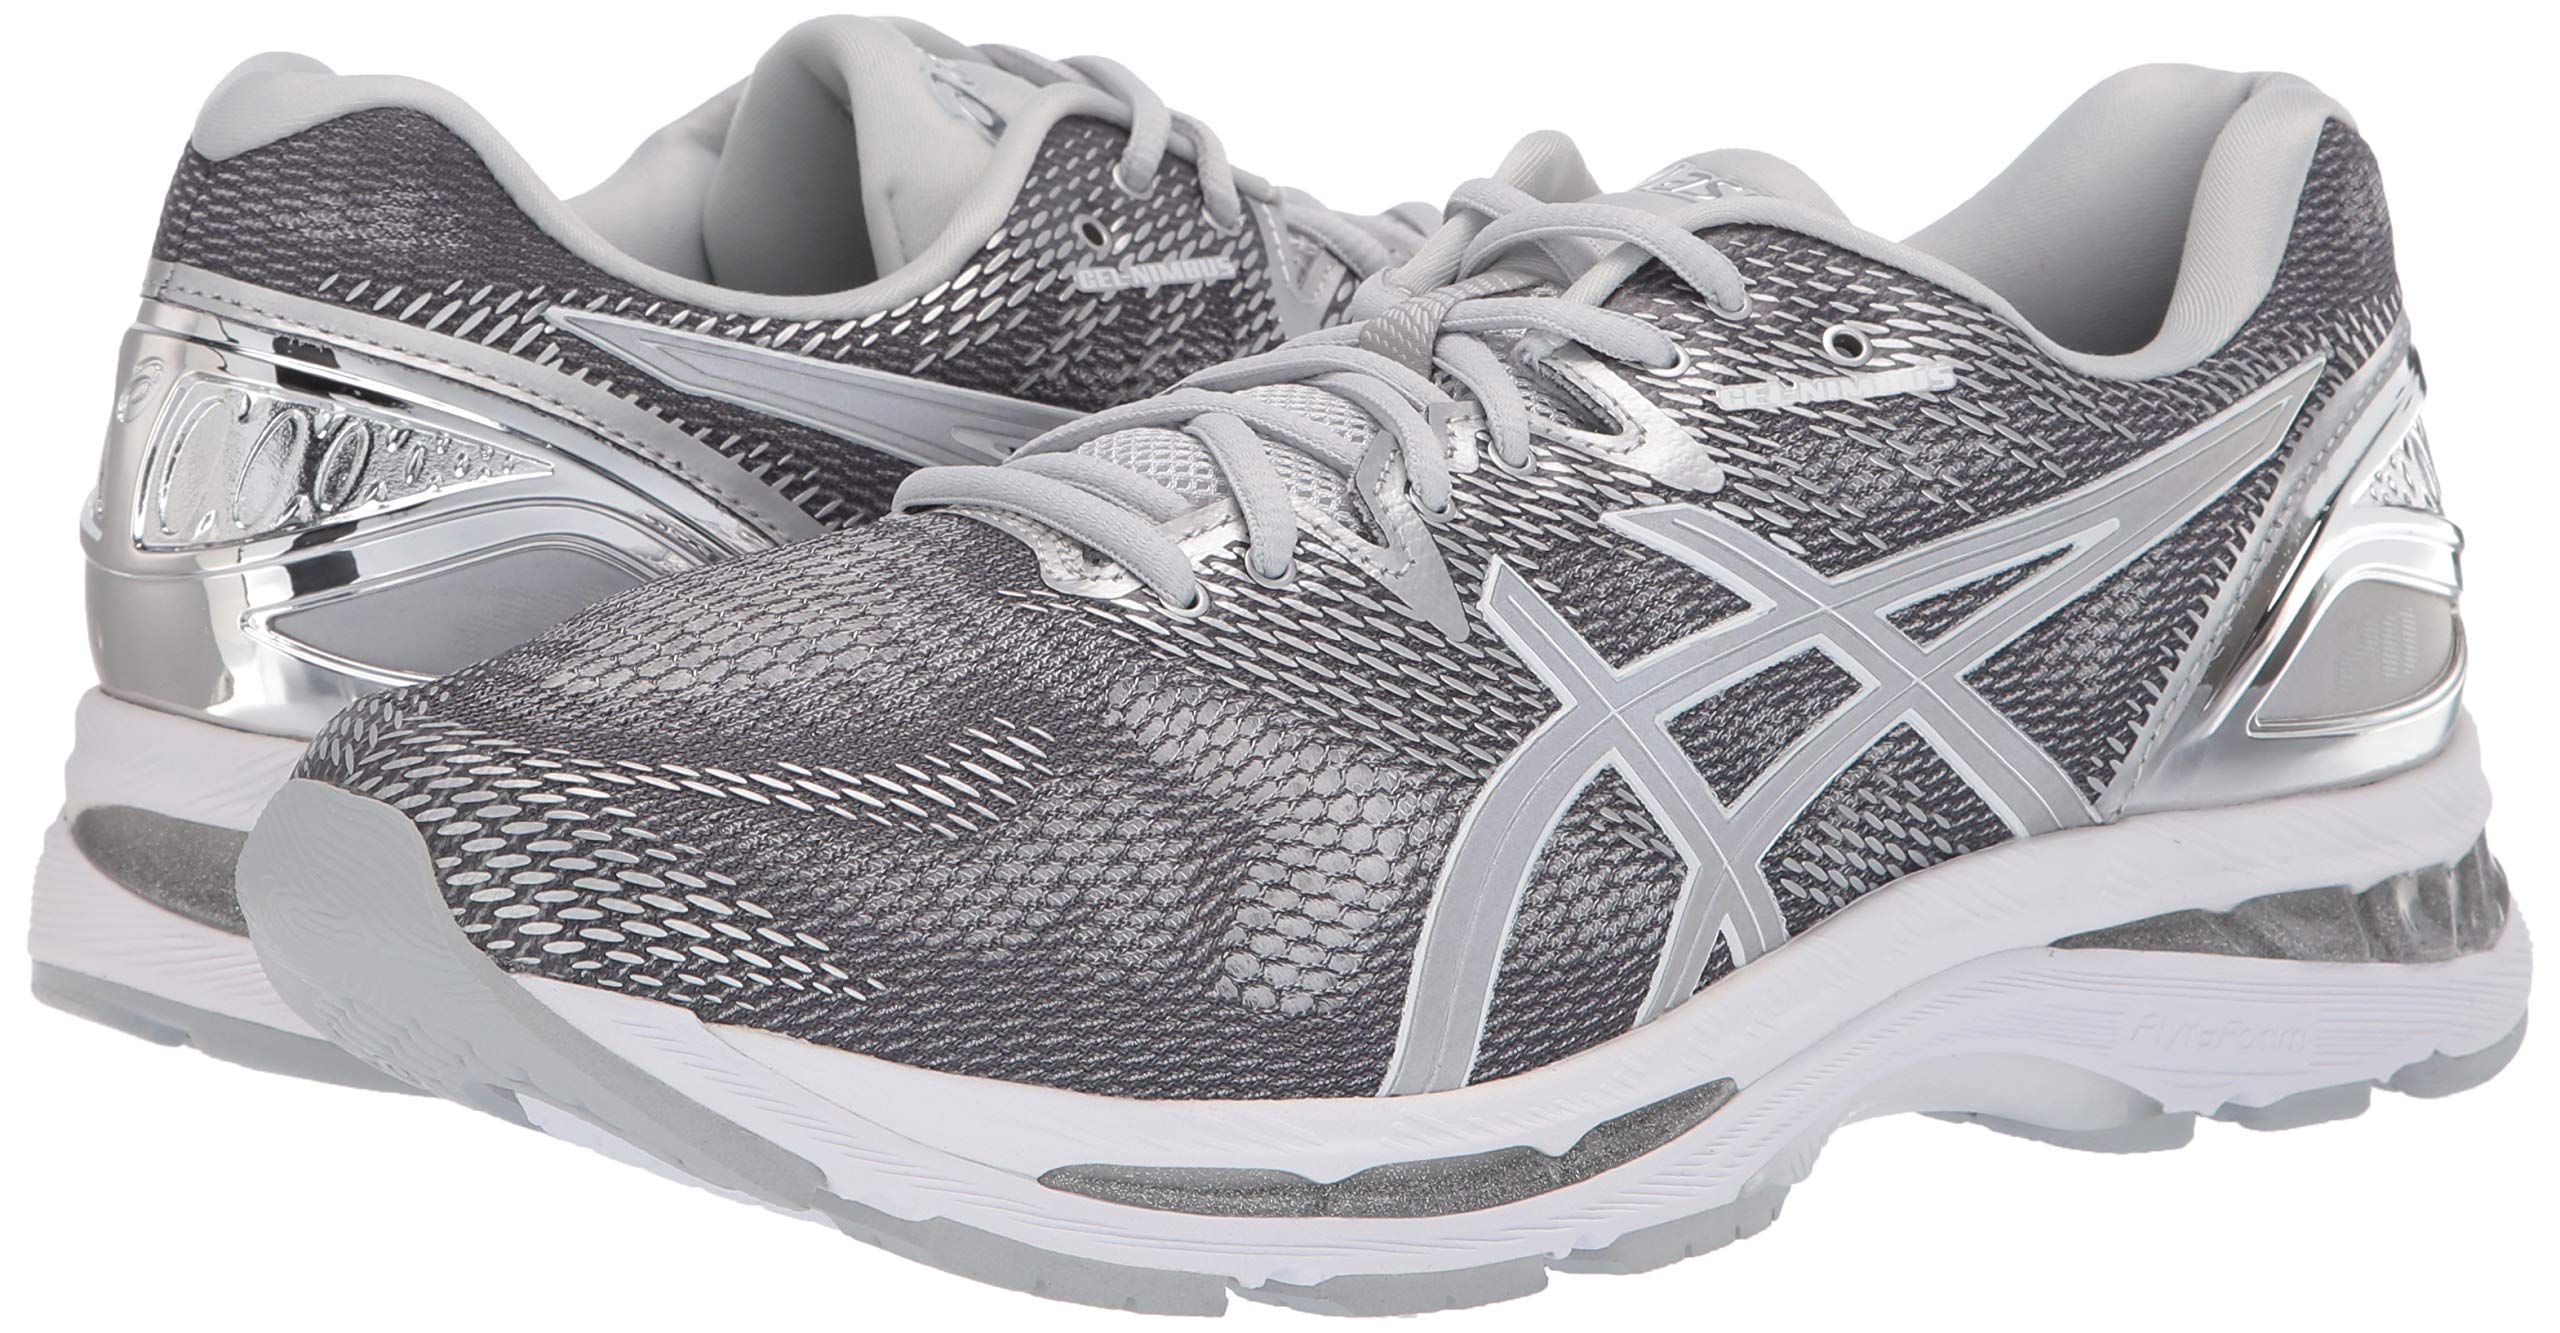 ASICS Mens Fitness/Cross-Training Trail Running Shoe, Carbon/Silver/White, 7 Medium US by ASICS (Image #5)